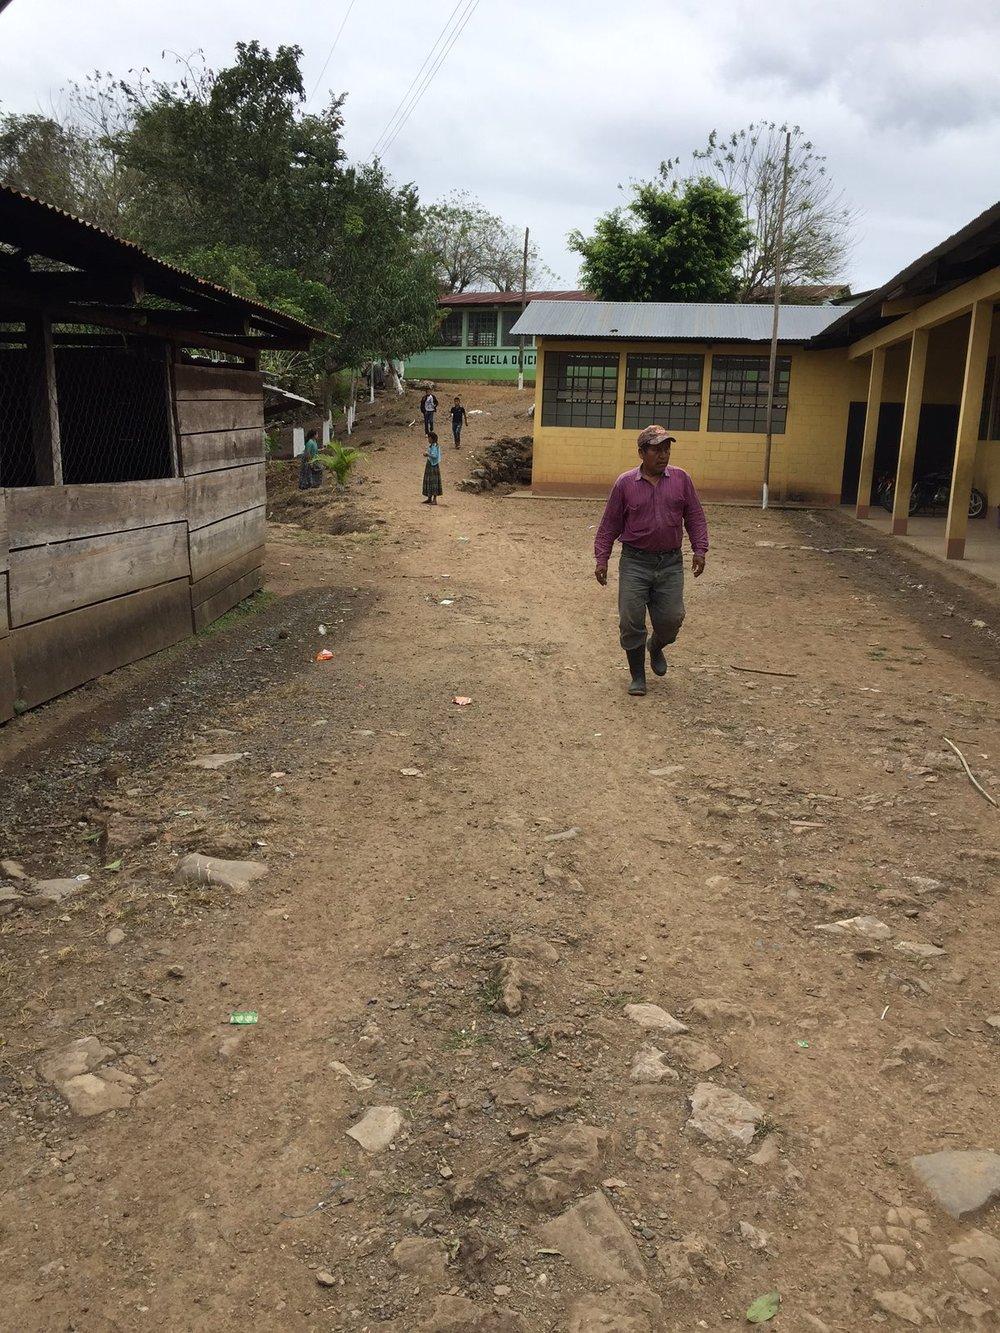 village of Tzalamtun, Cahabon, Alta Verapaz, Guatemala.